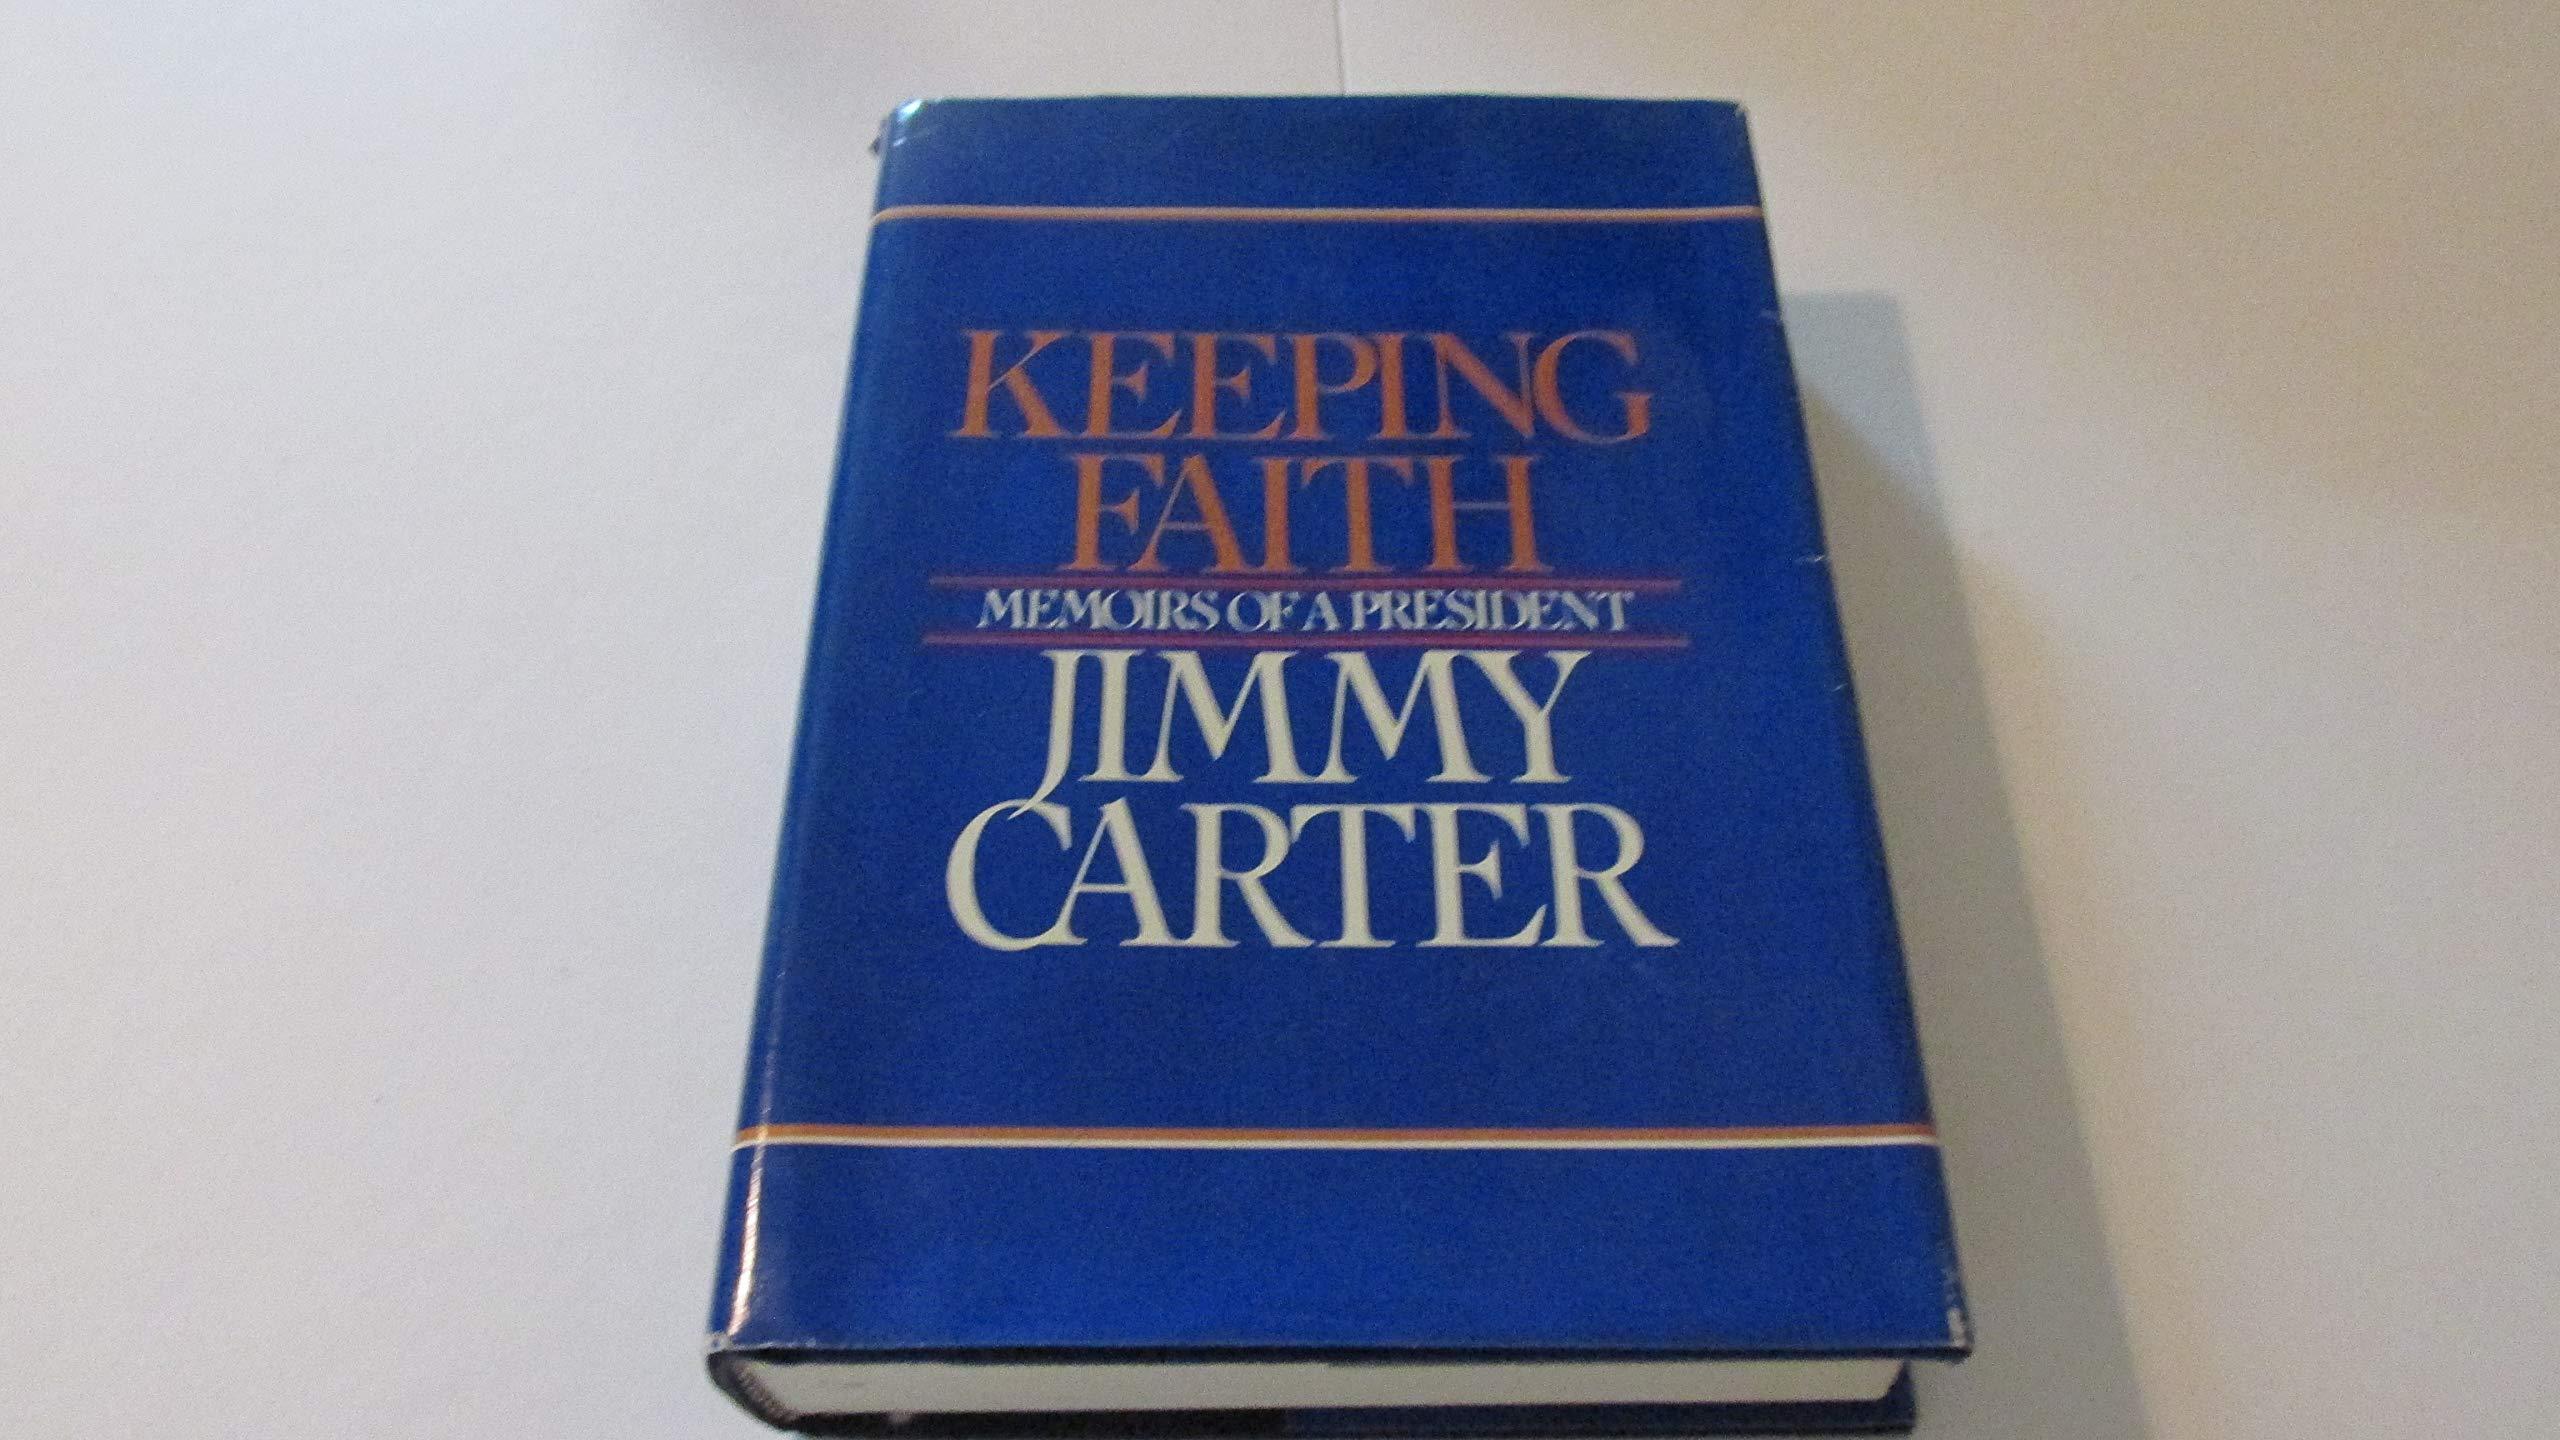 Keeping faith Memoirs of a president